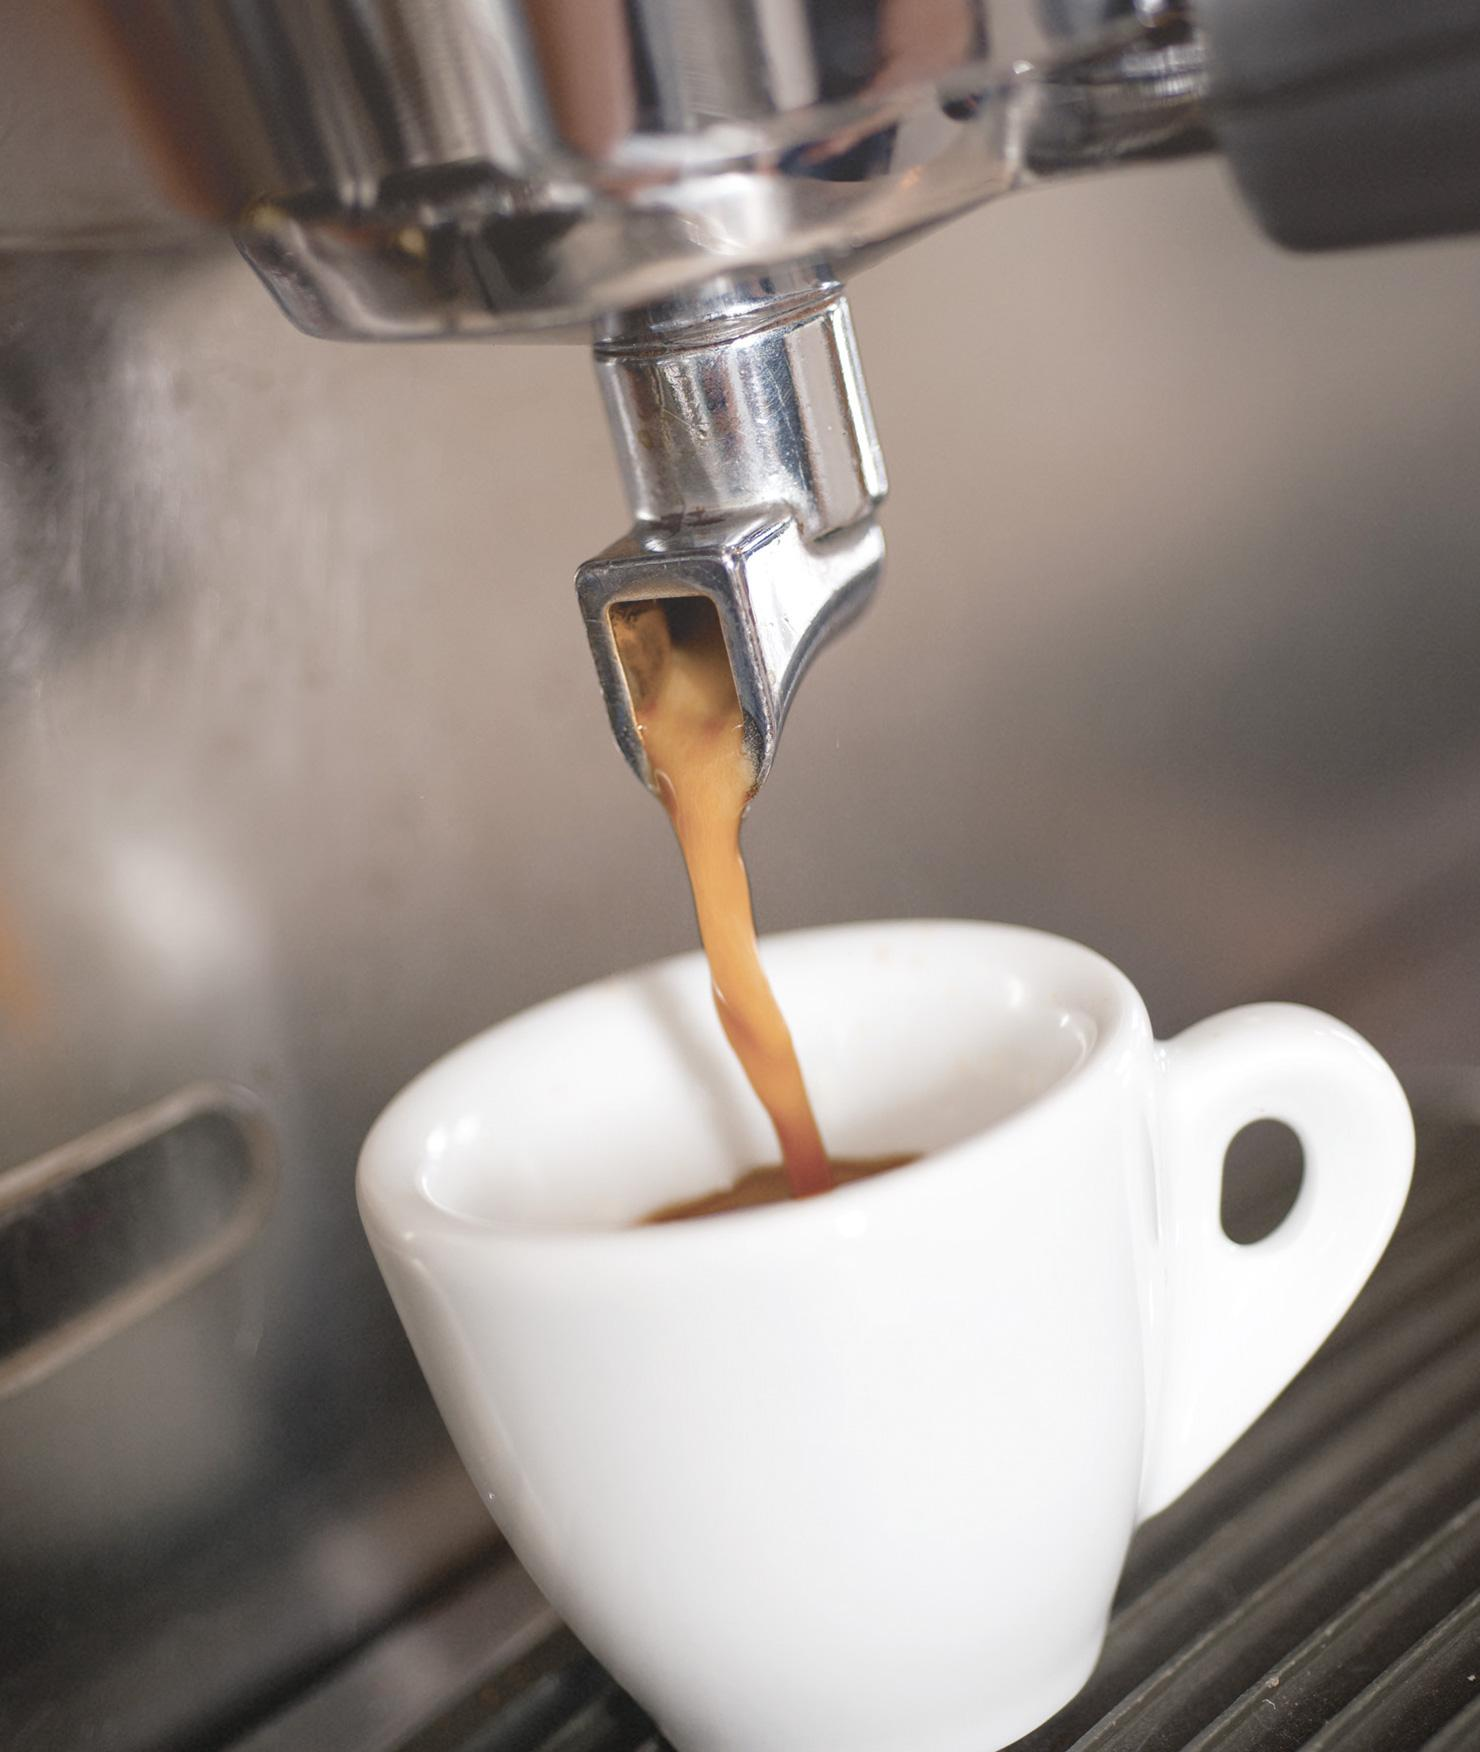 BRITA filter Purity C Finest making coffee